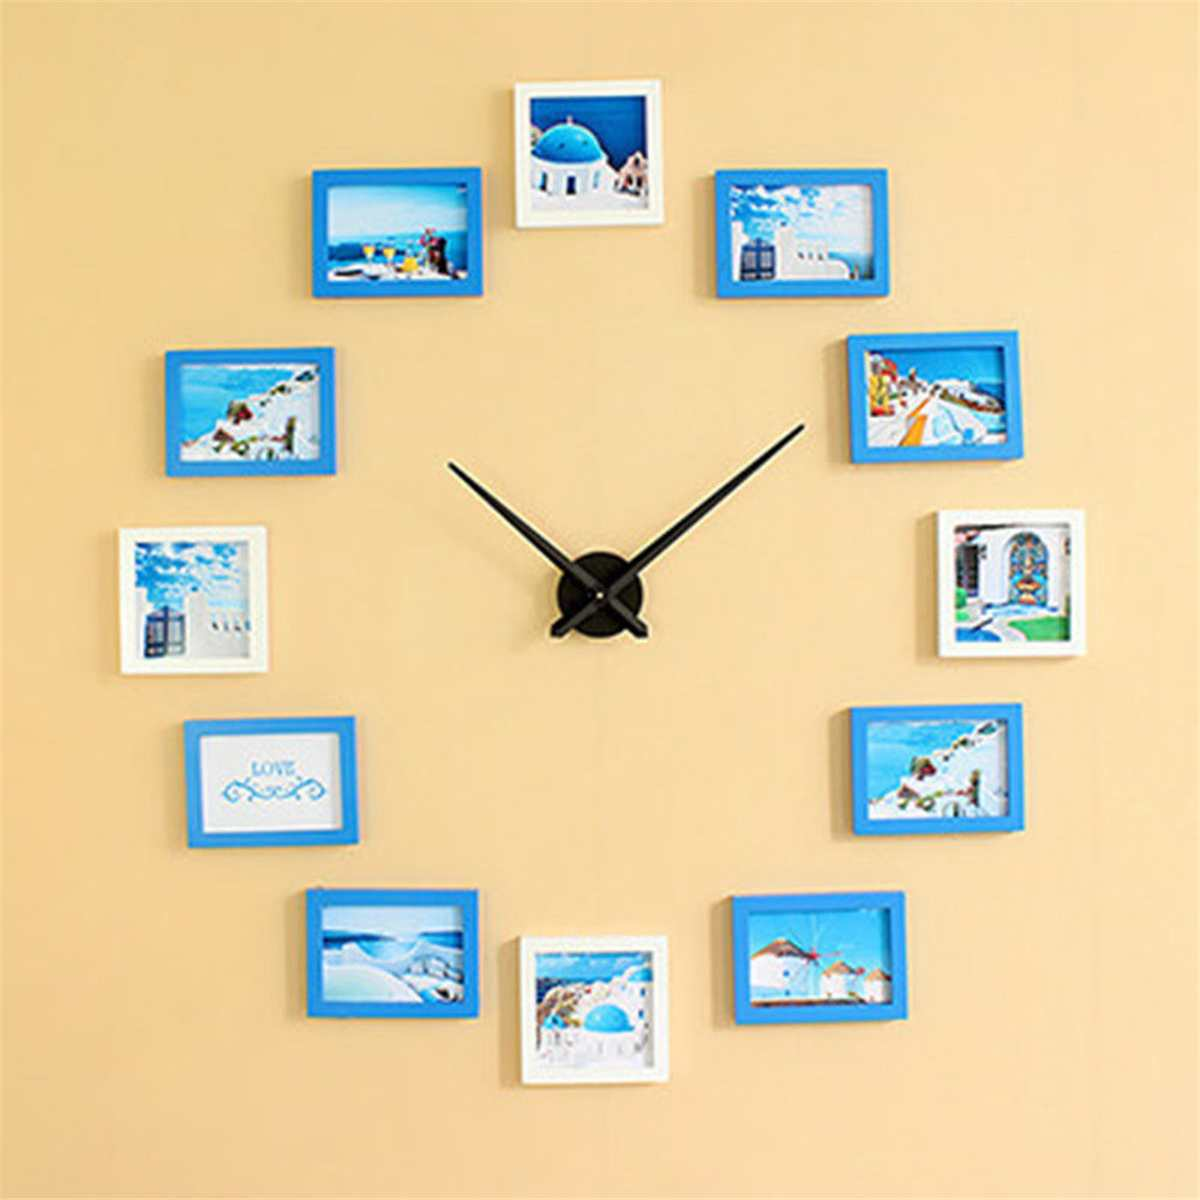 2019 New DIY Wall Clock Modern Design DIY Photo Frame Clock Art Pictures Clock Unique Klok Home Decor 12 Photo Frames Nordic